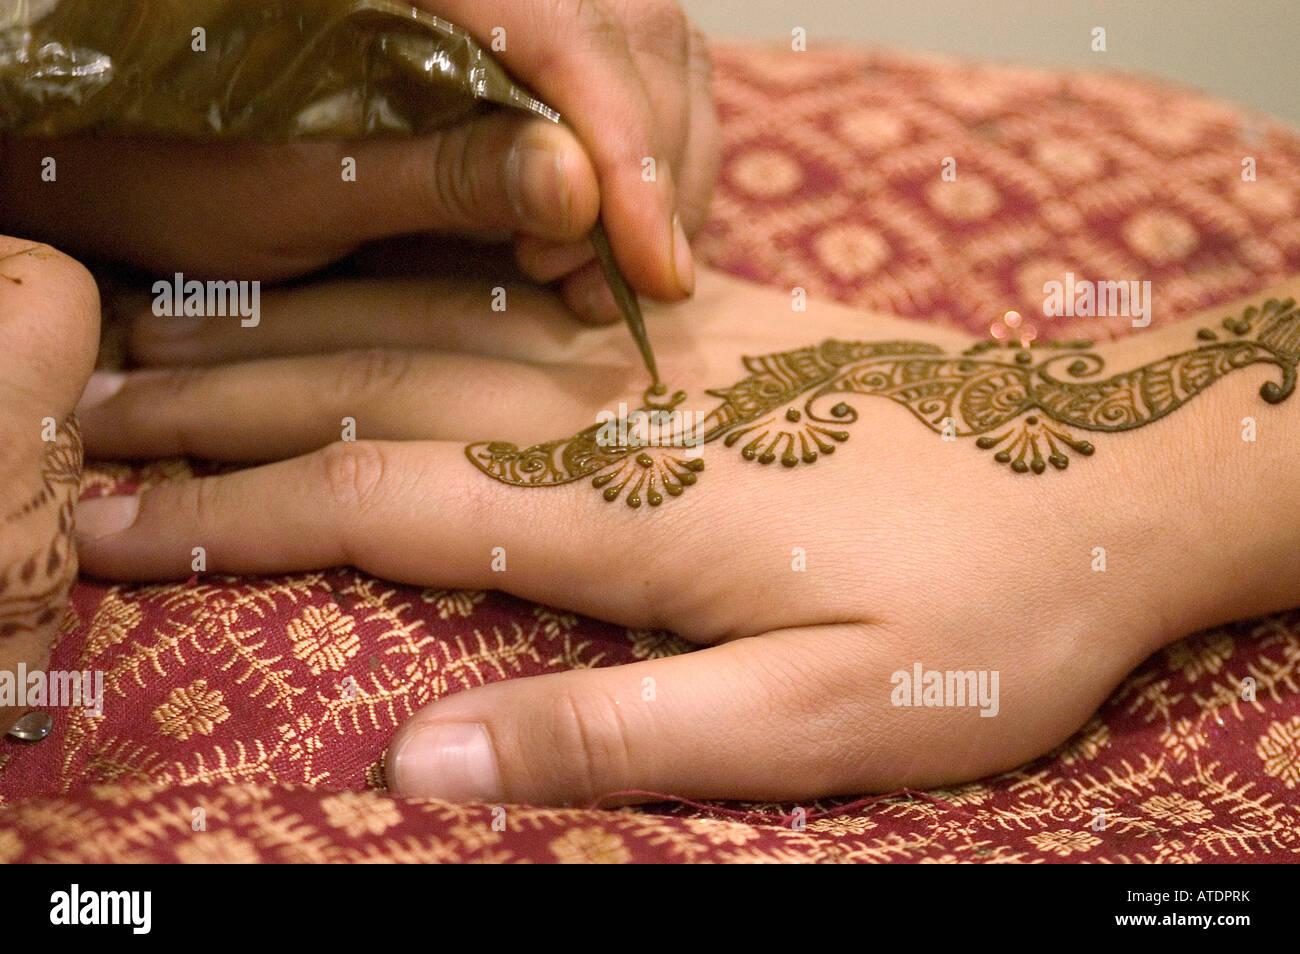 Tatuaje De Henna Body Art Detalle Mano Mujer Cultura Cultura Típica